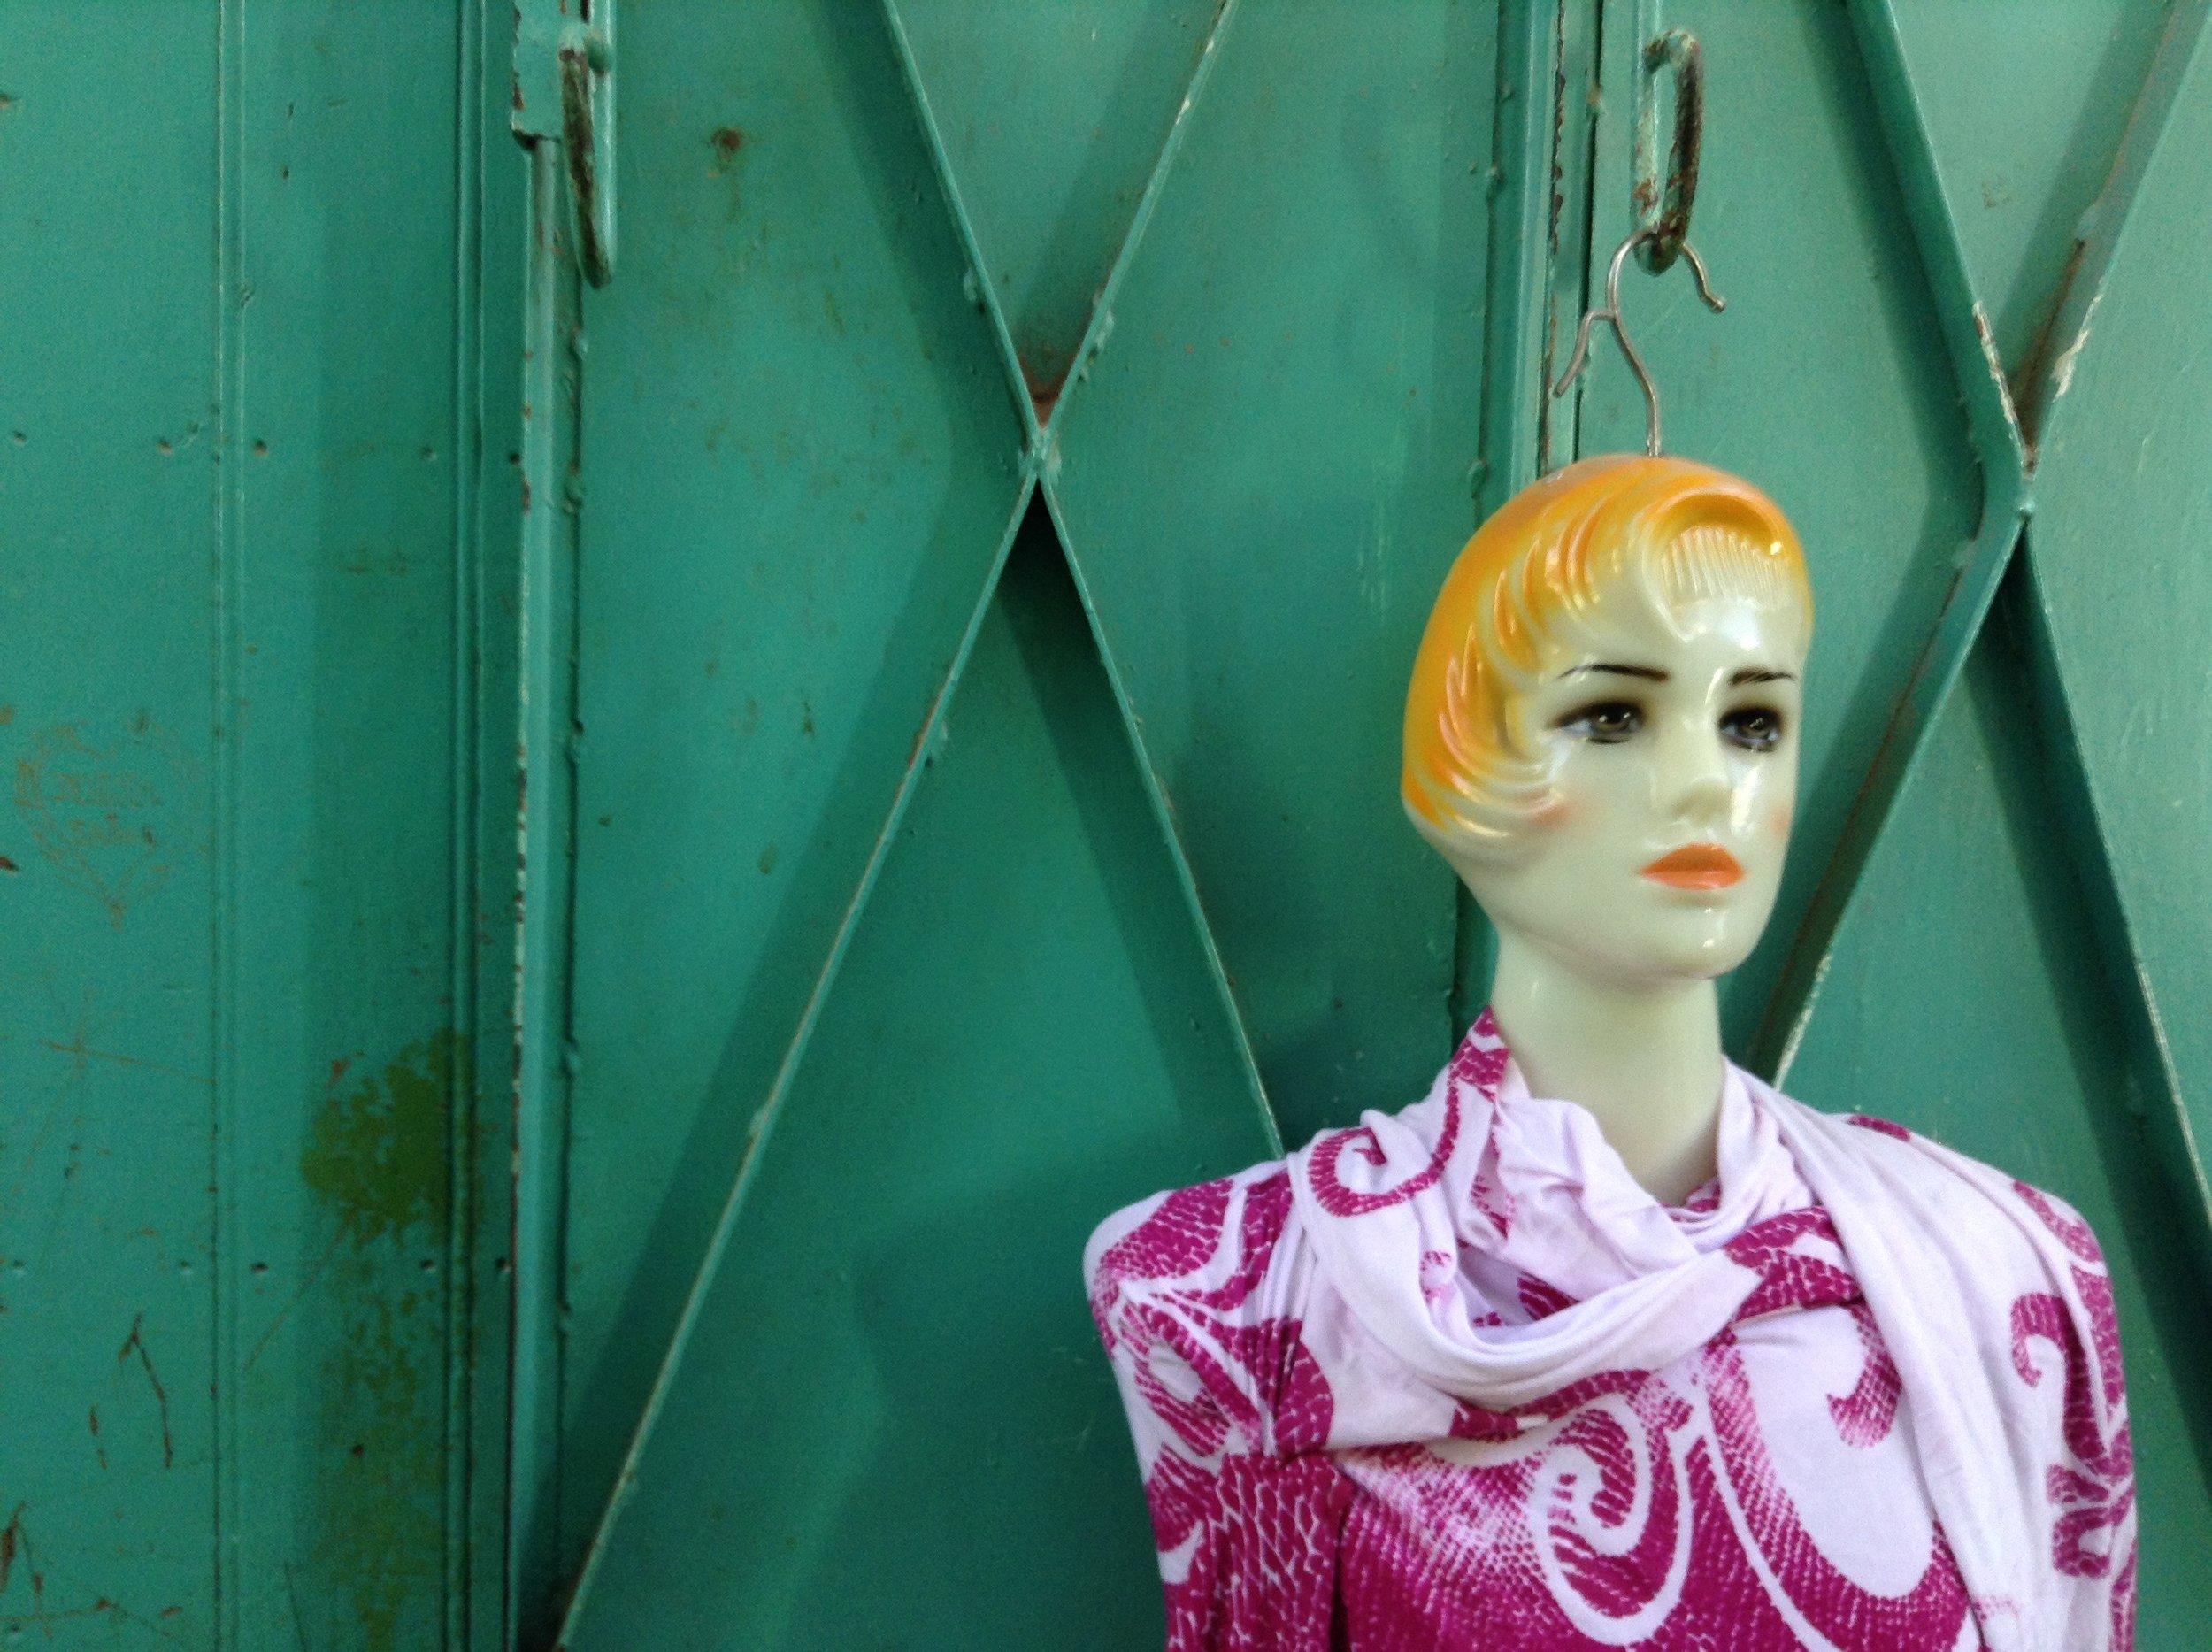 Street shop, Sefrou